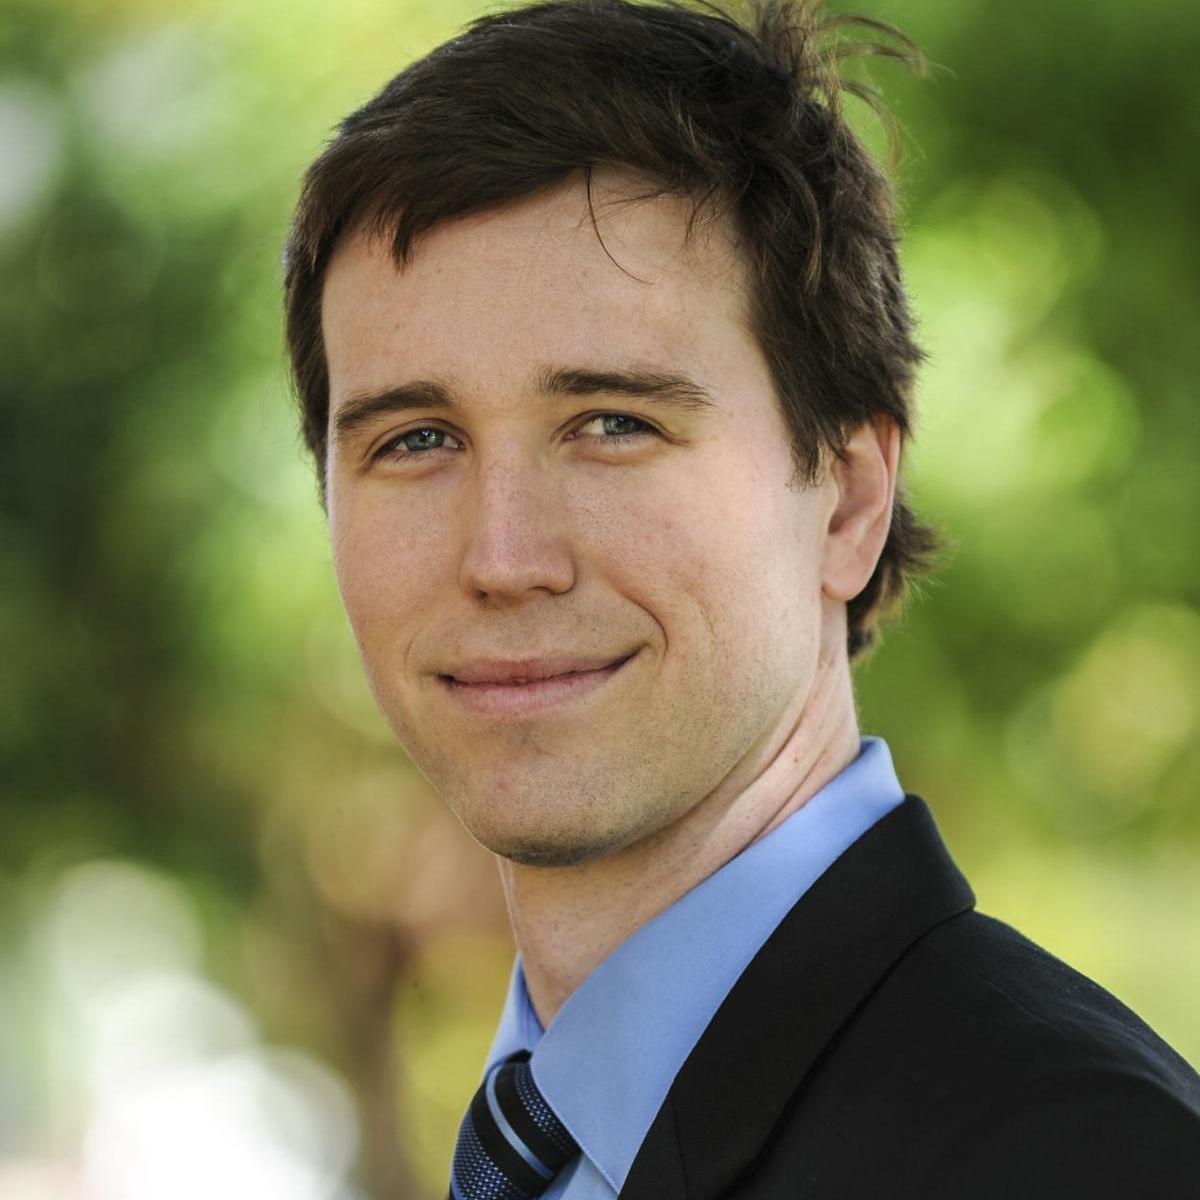 Major Deacon's Profile Photo